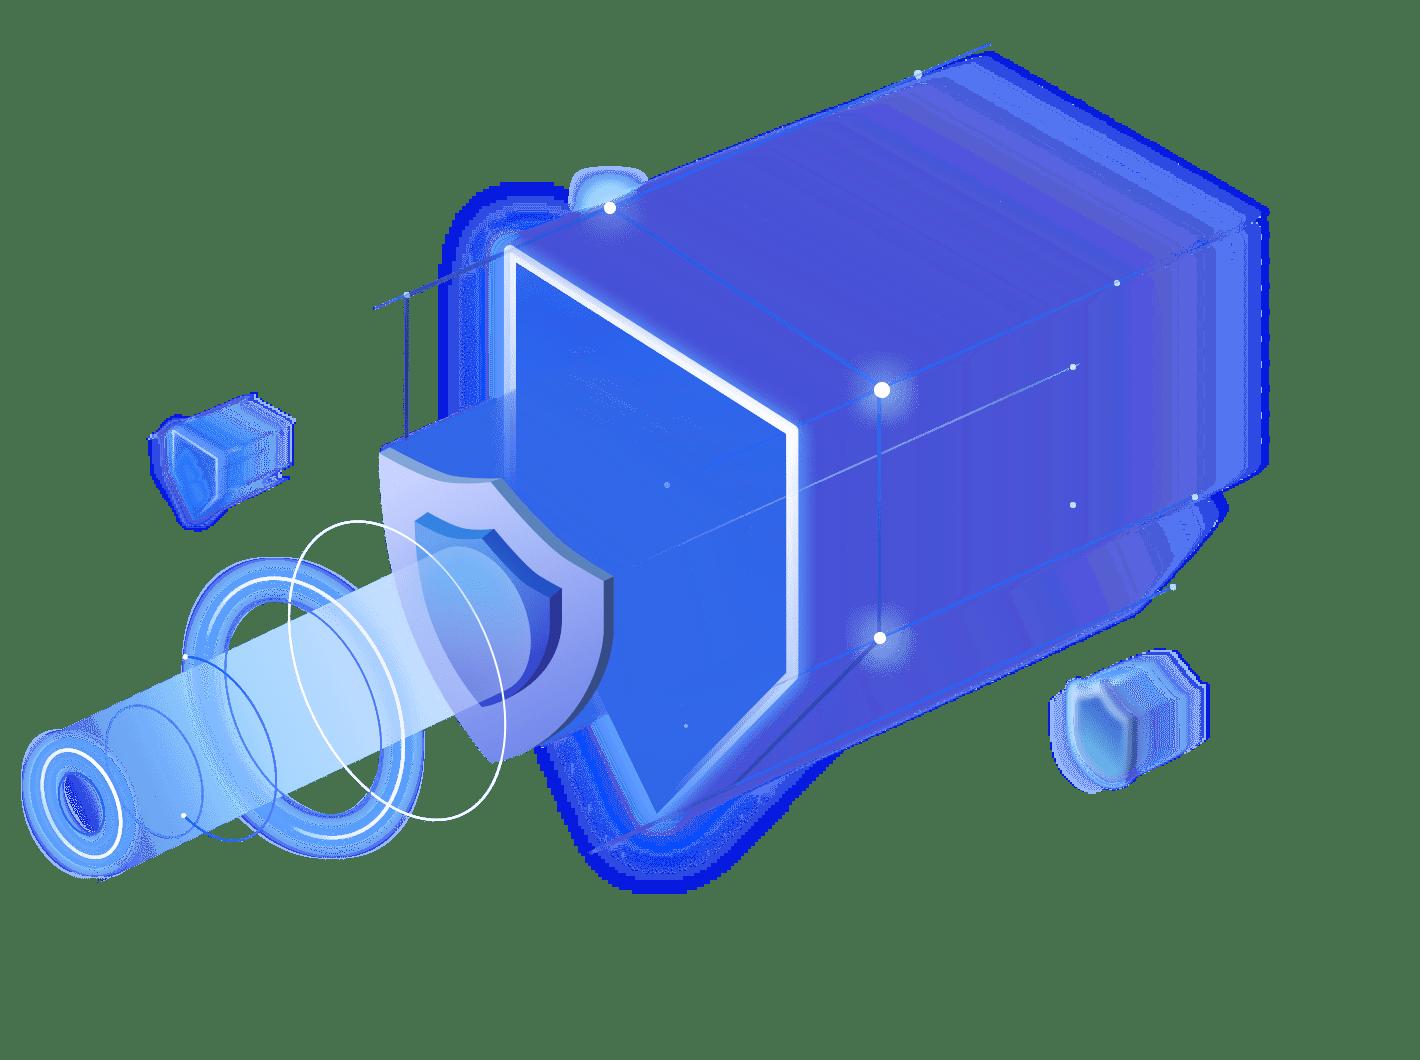 YITU Technology | YITU Explore the AI World